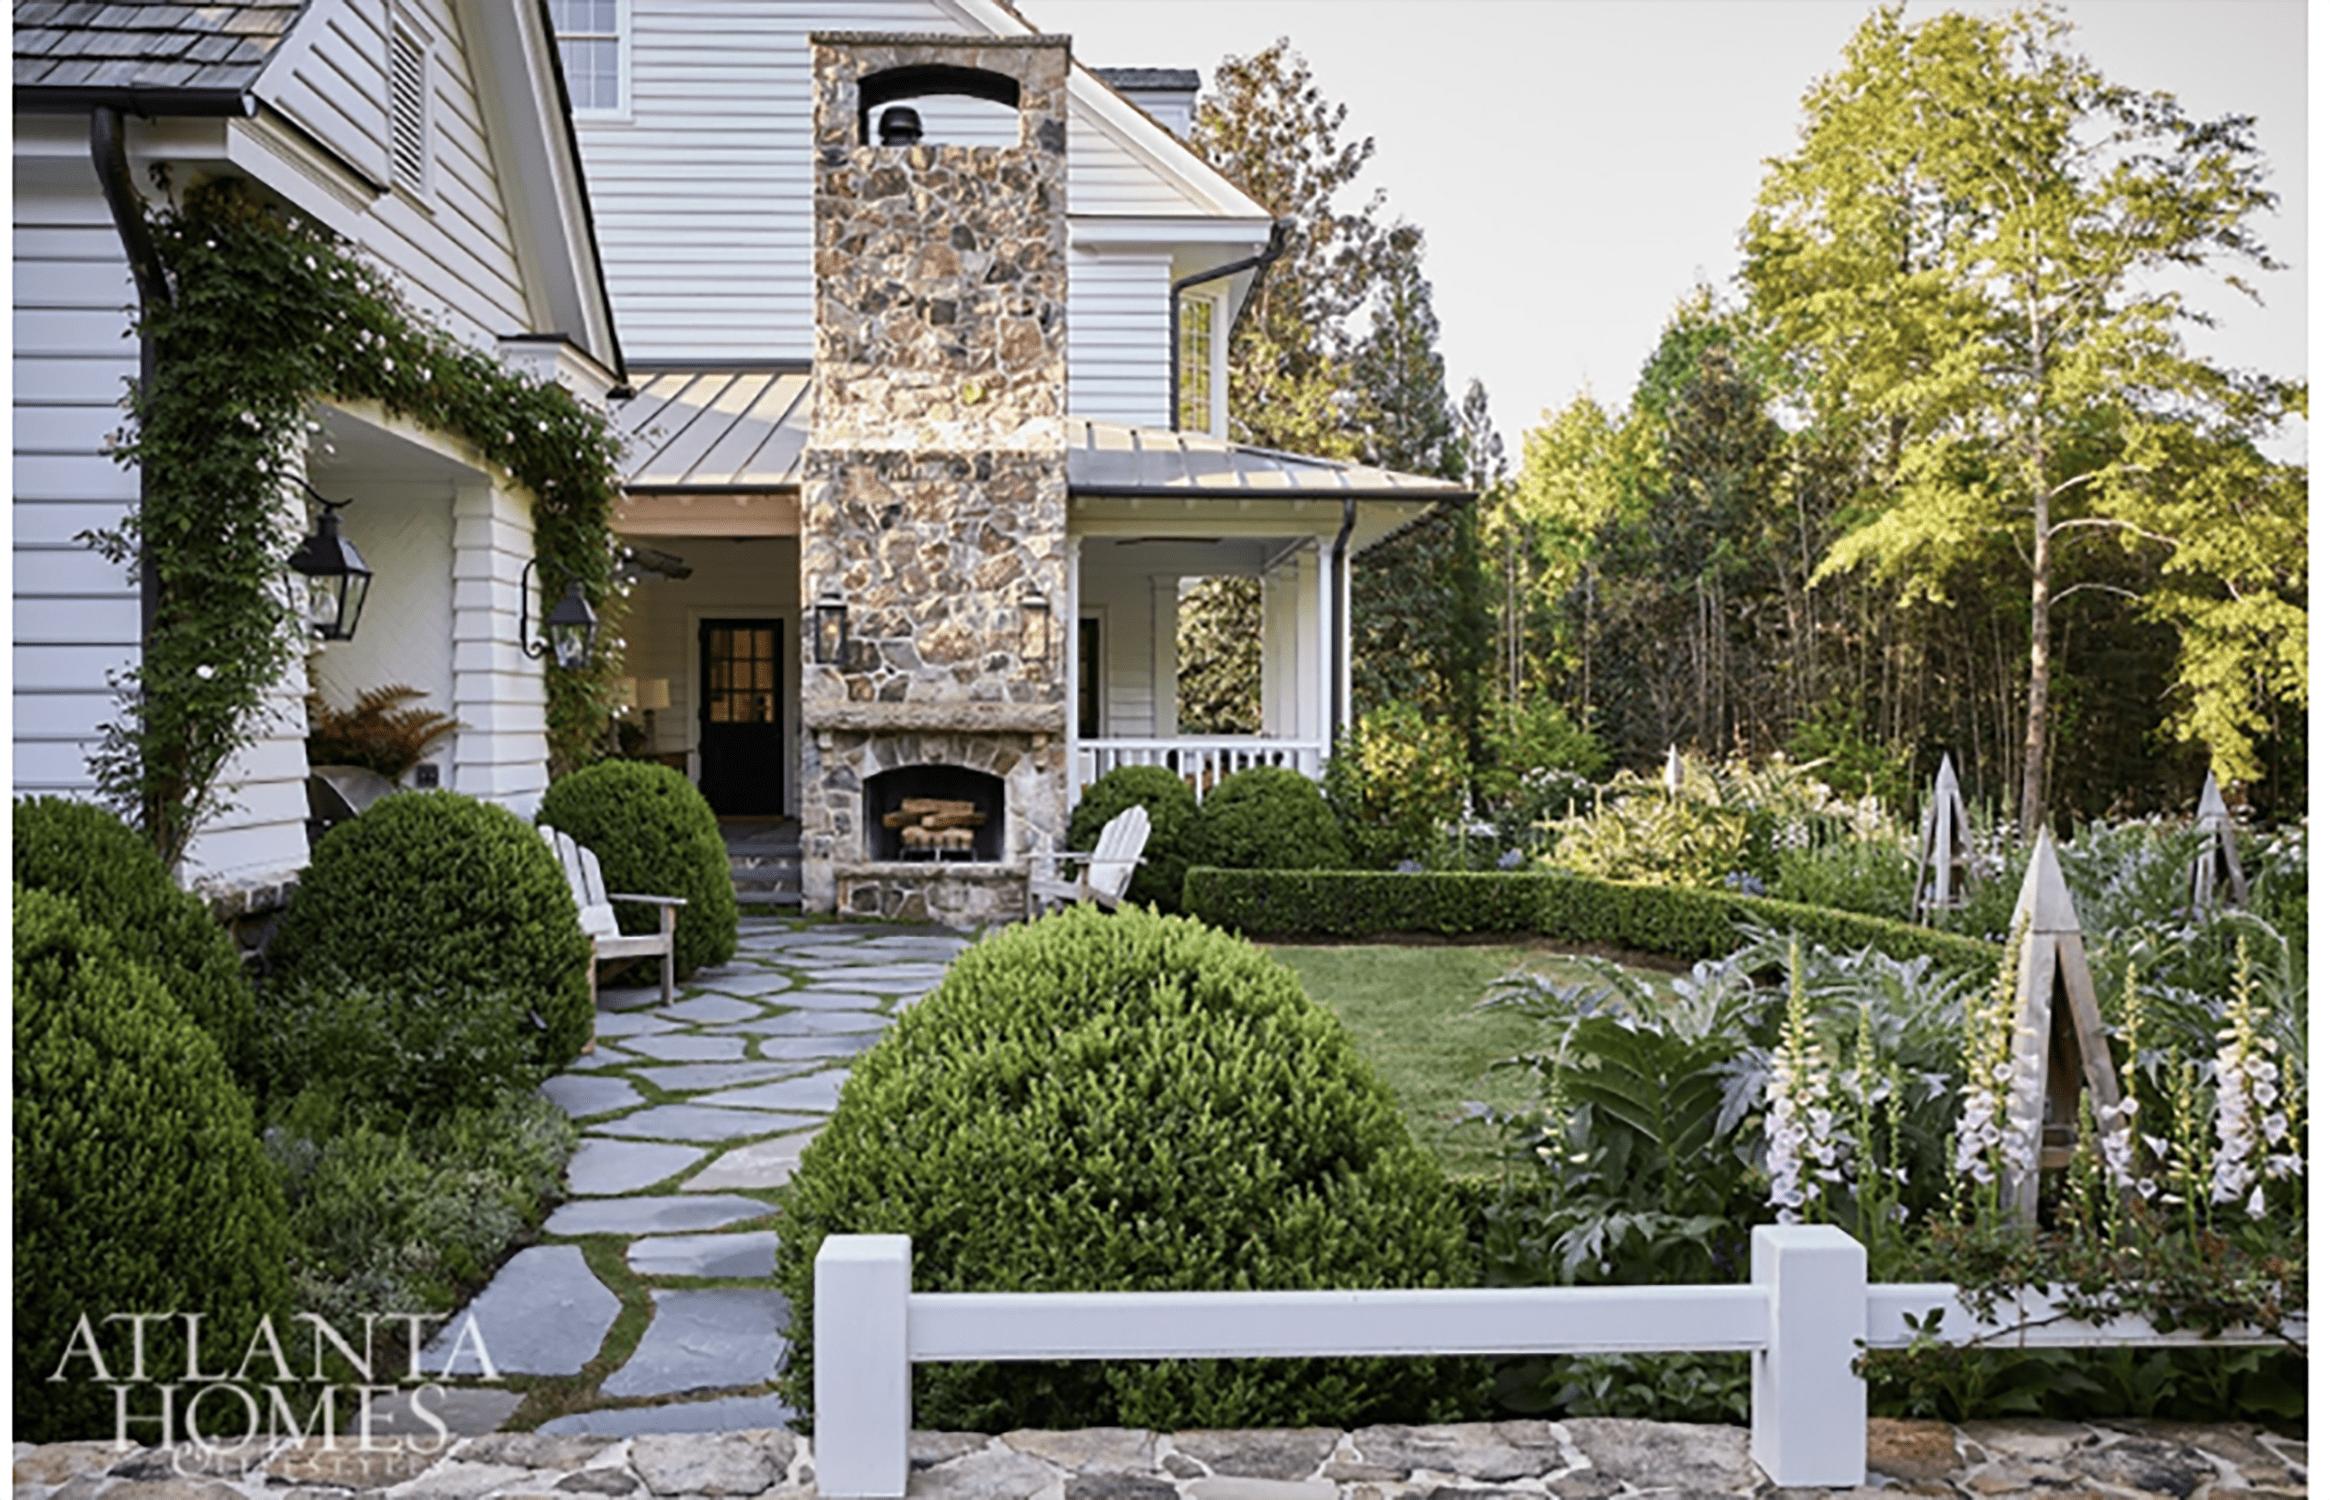 design chic:atlanta homes farm house